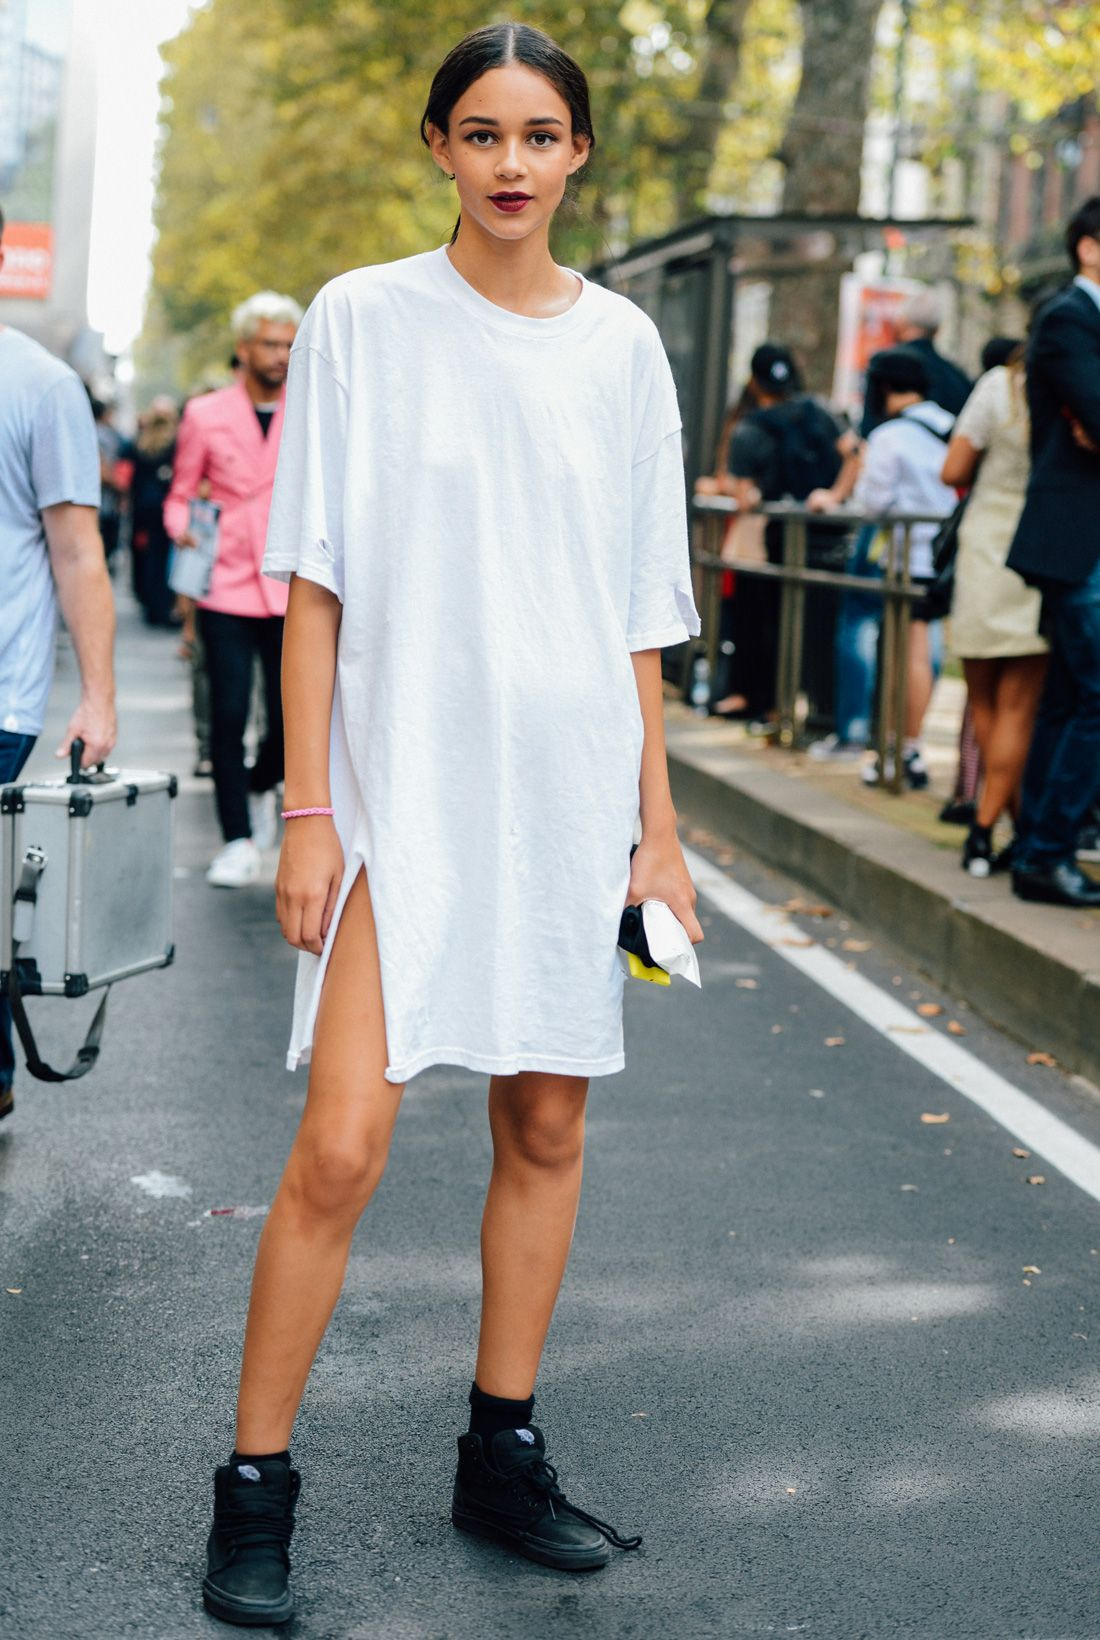 Basic tee white dress